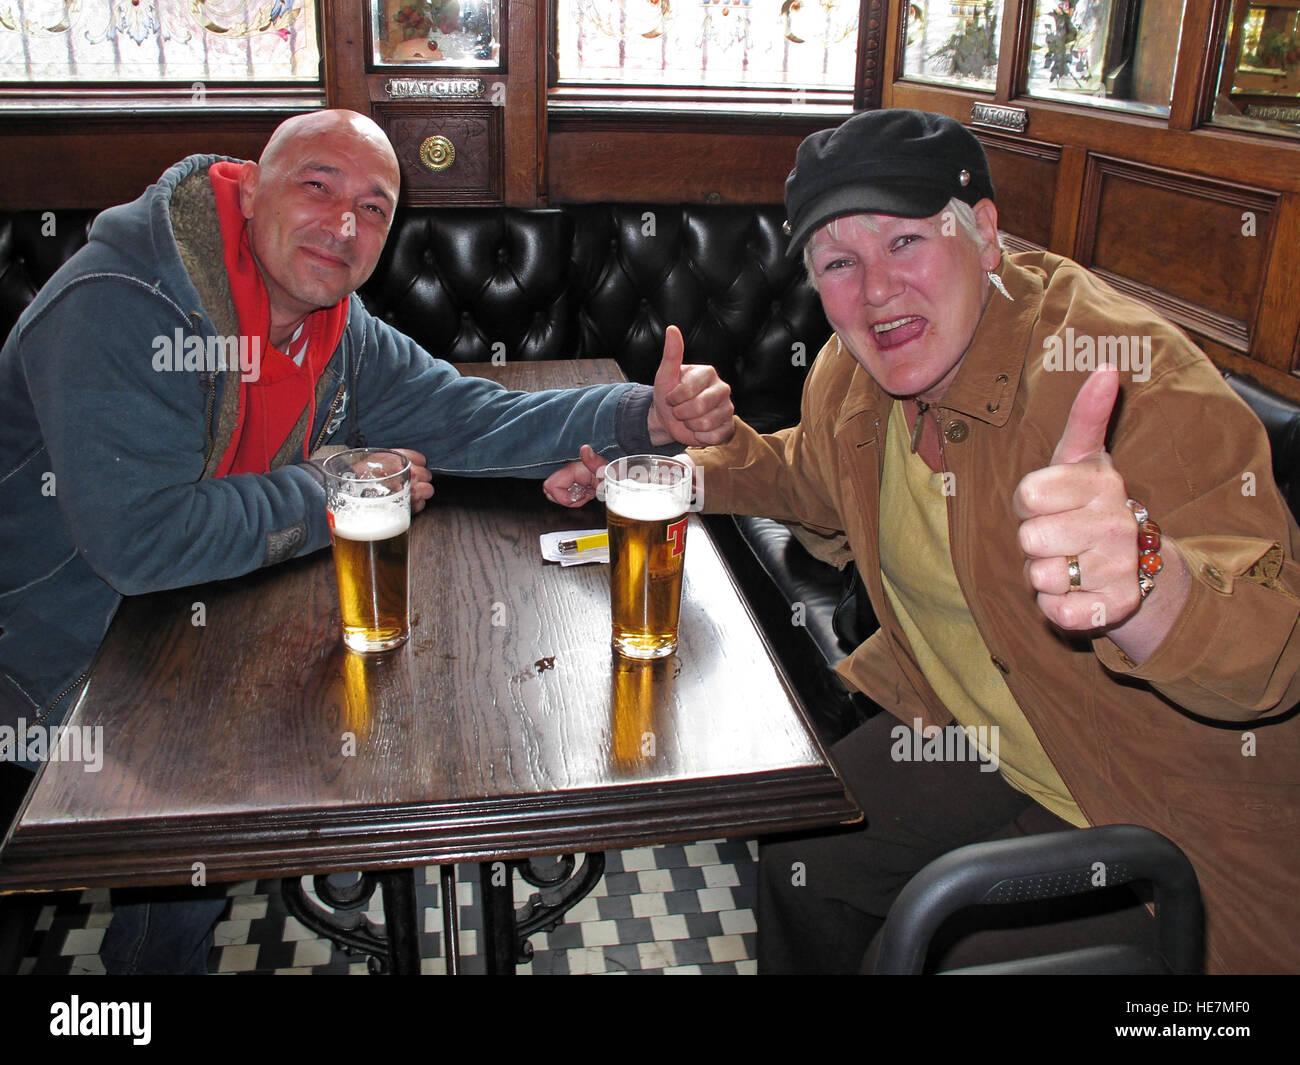 Laden Sie dieses Alamy Stockfoto Trinker in der berühmten Krone Bar, Gt Victoria St, Belfast - HE7MF0